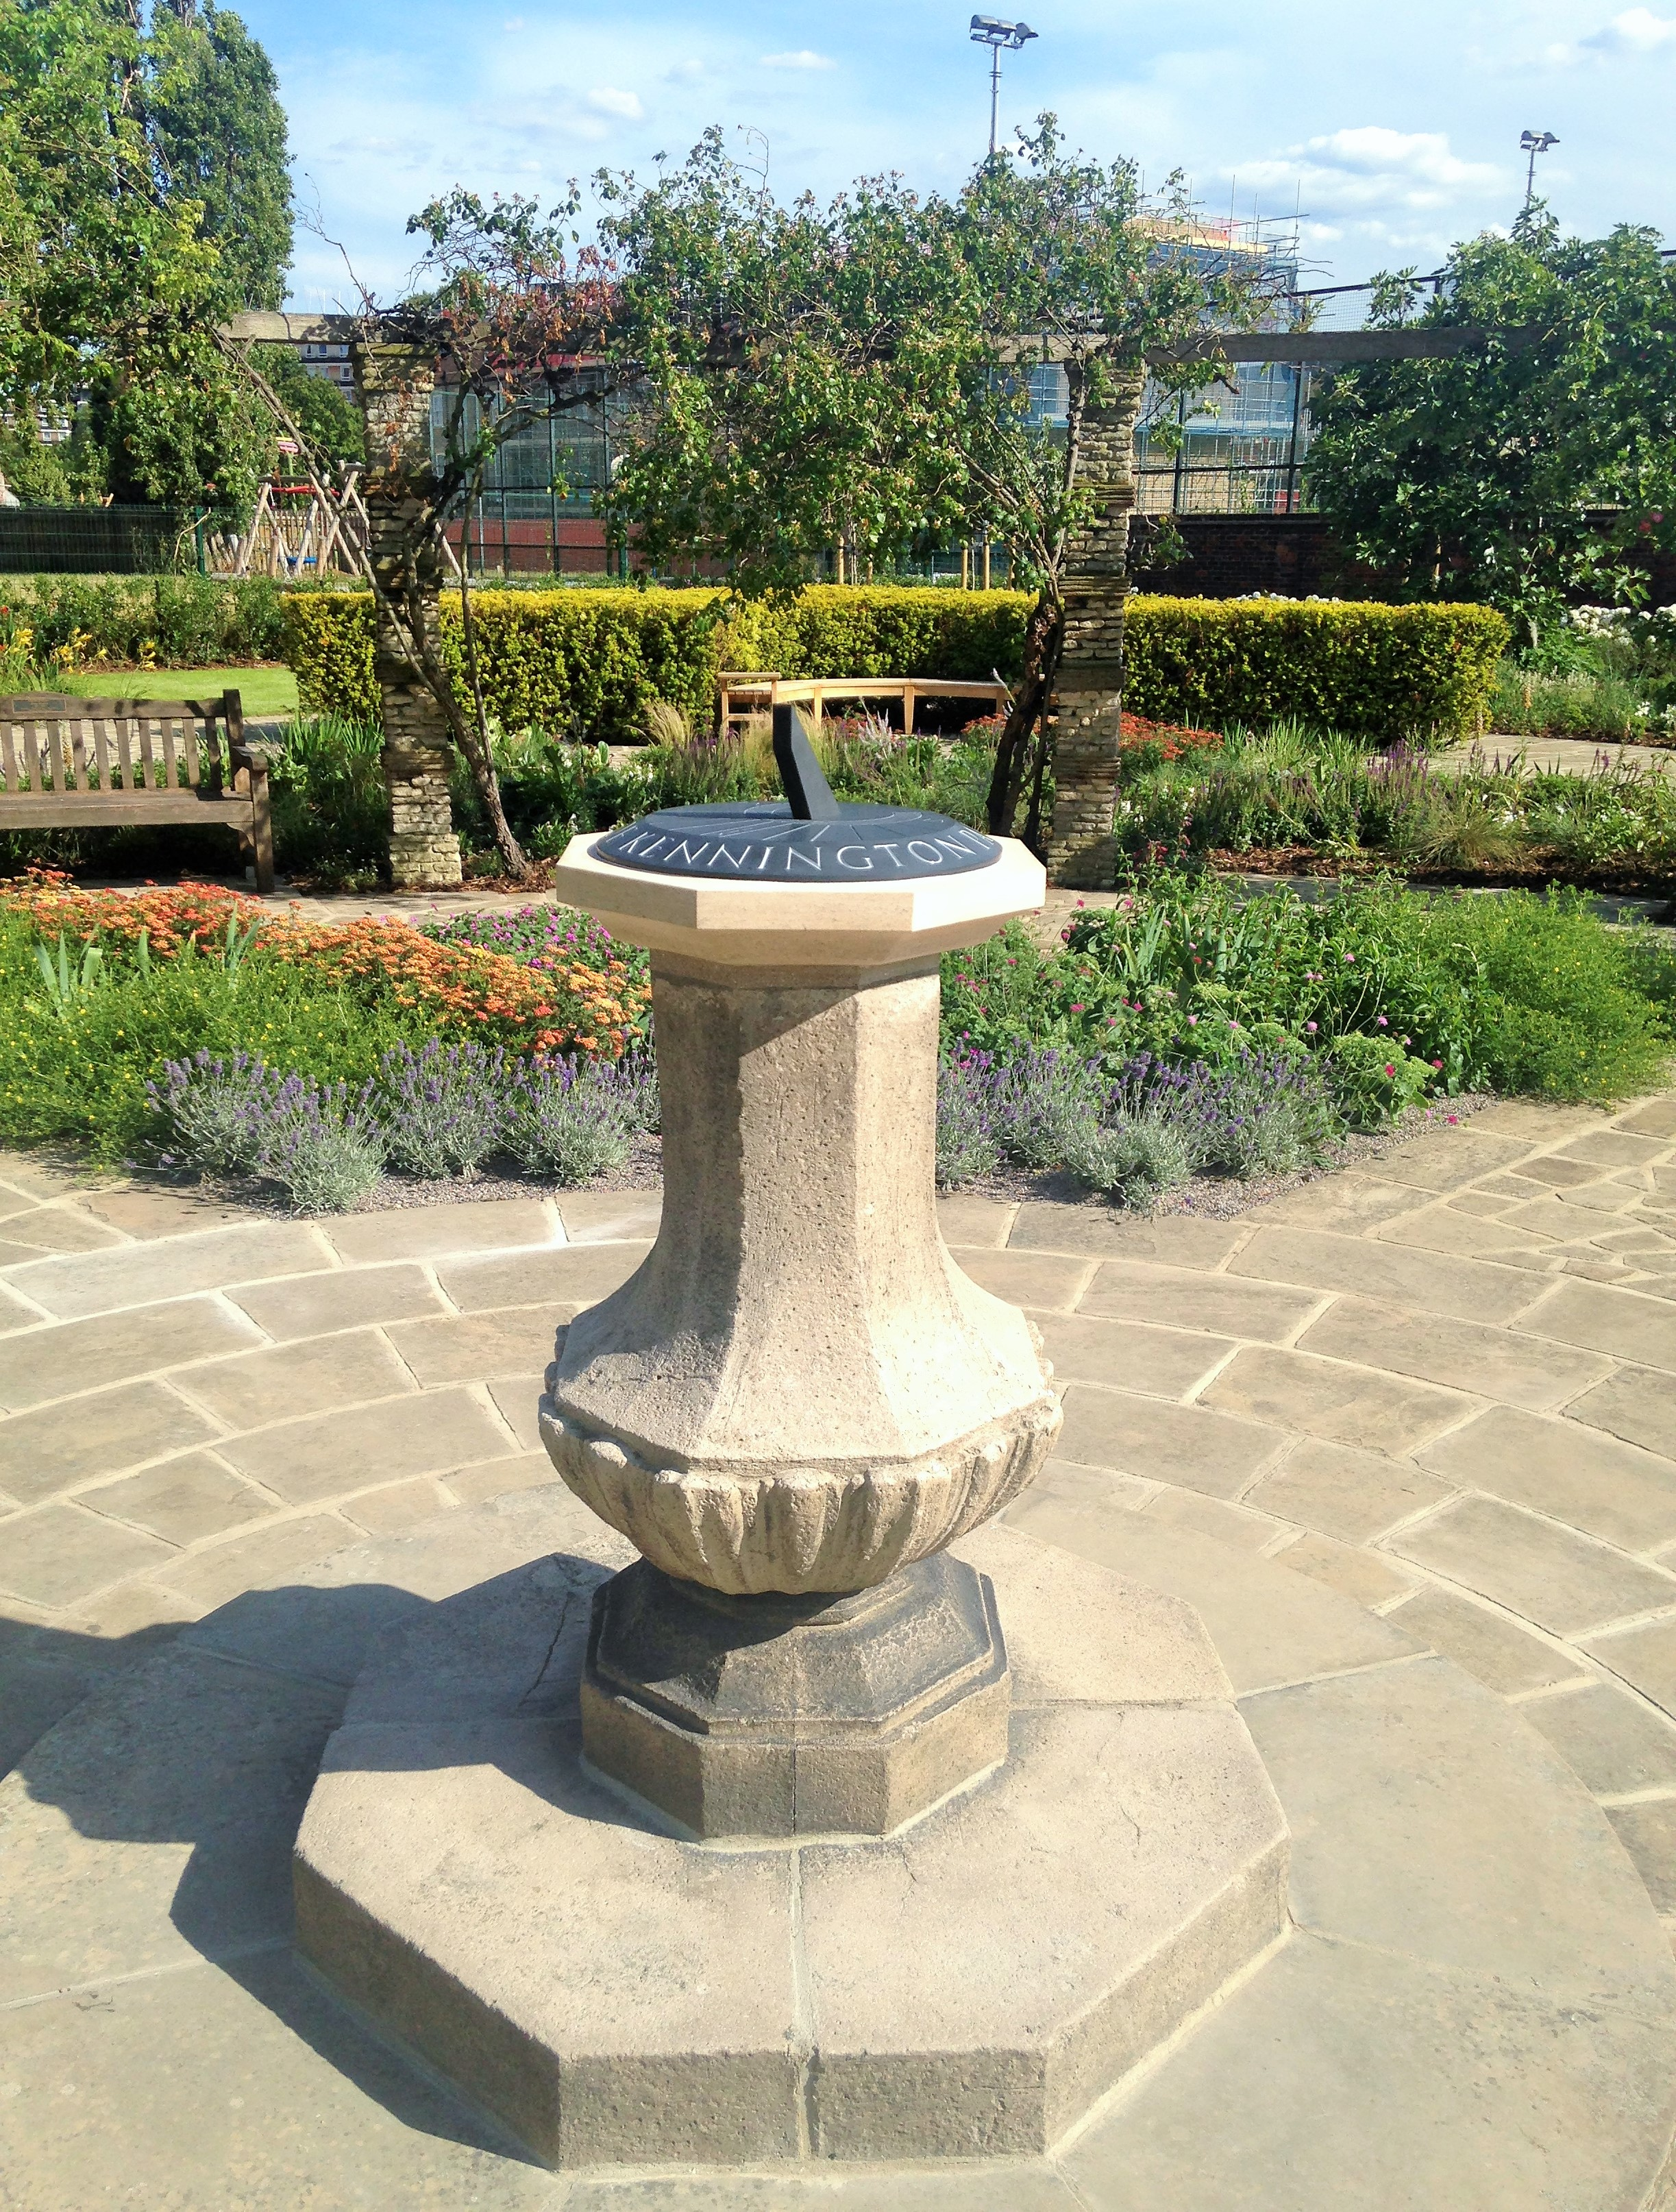 Kennington Park Flower Garden sundial - kenningtonrunoff.com